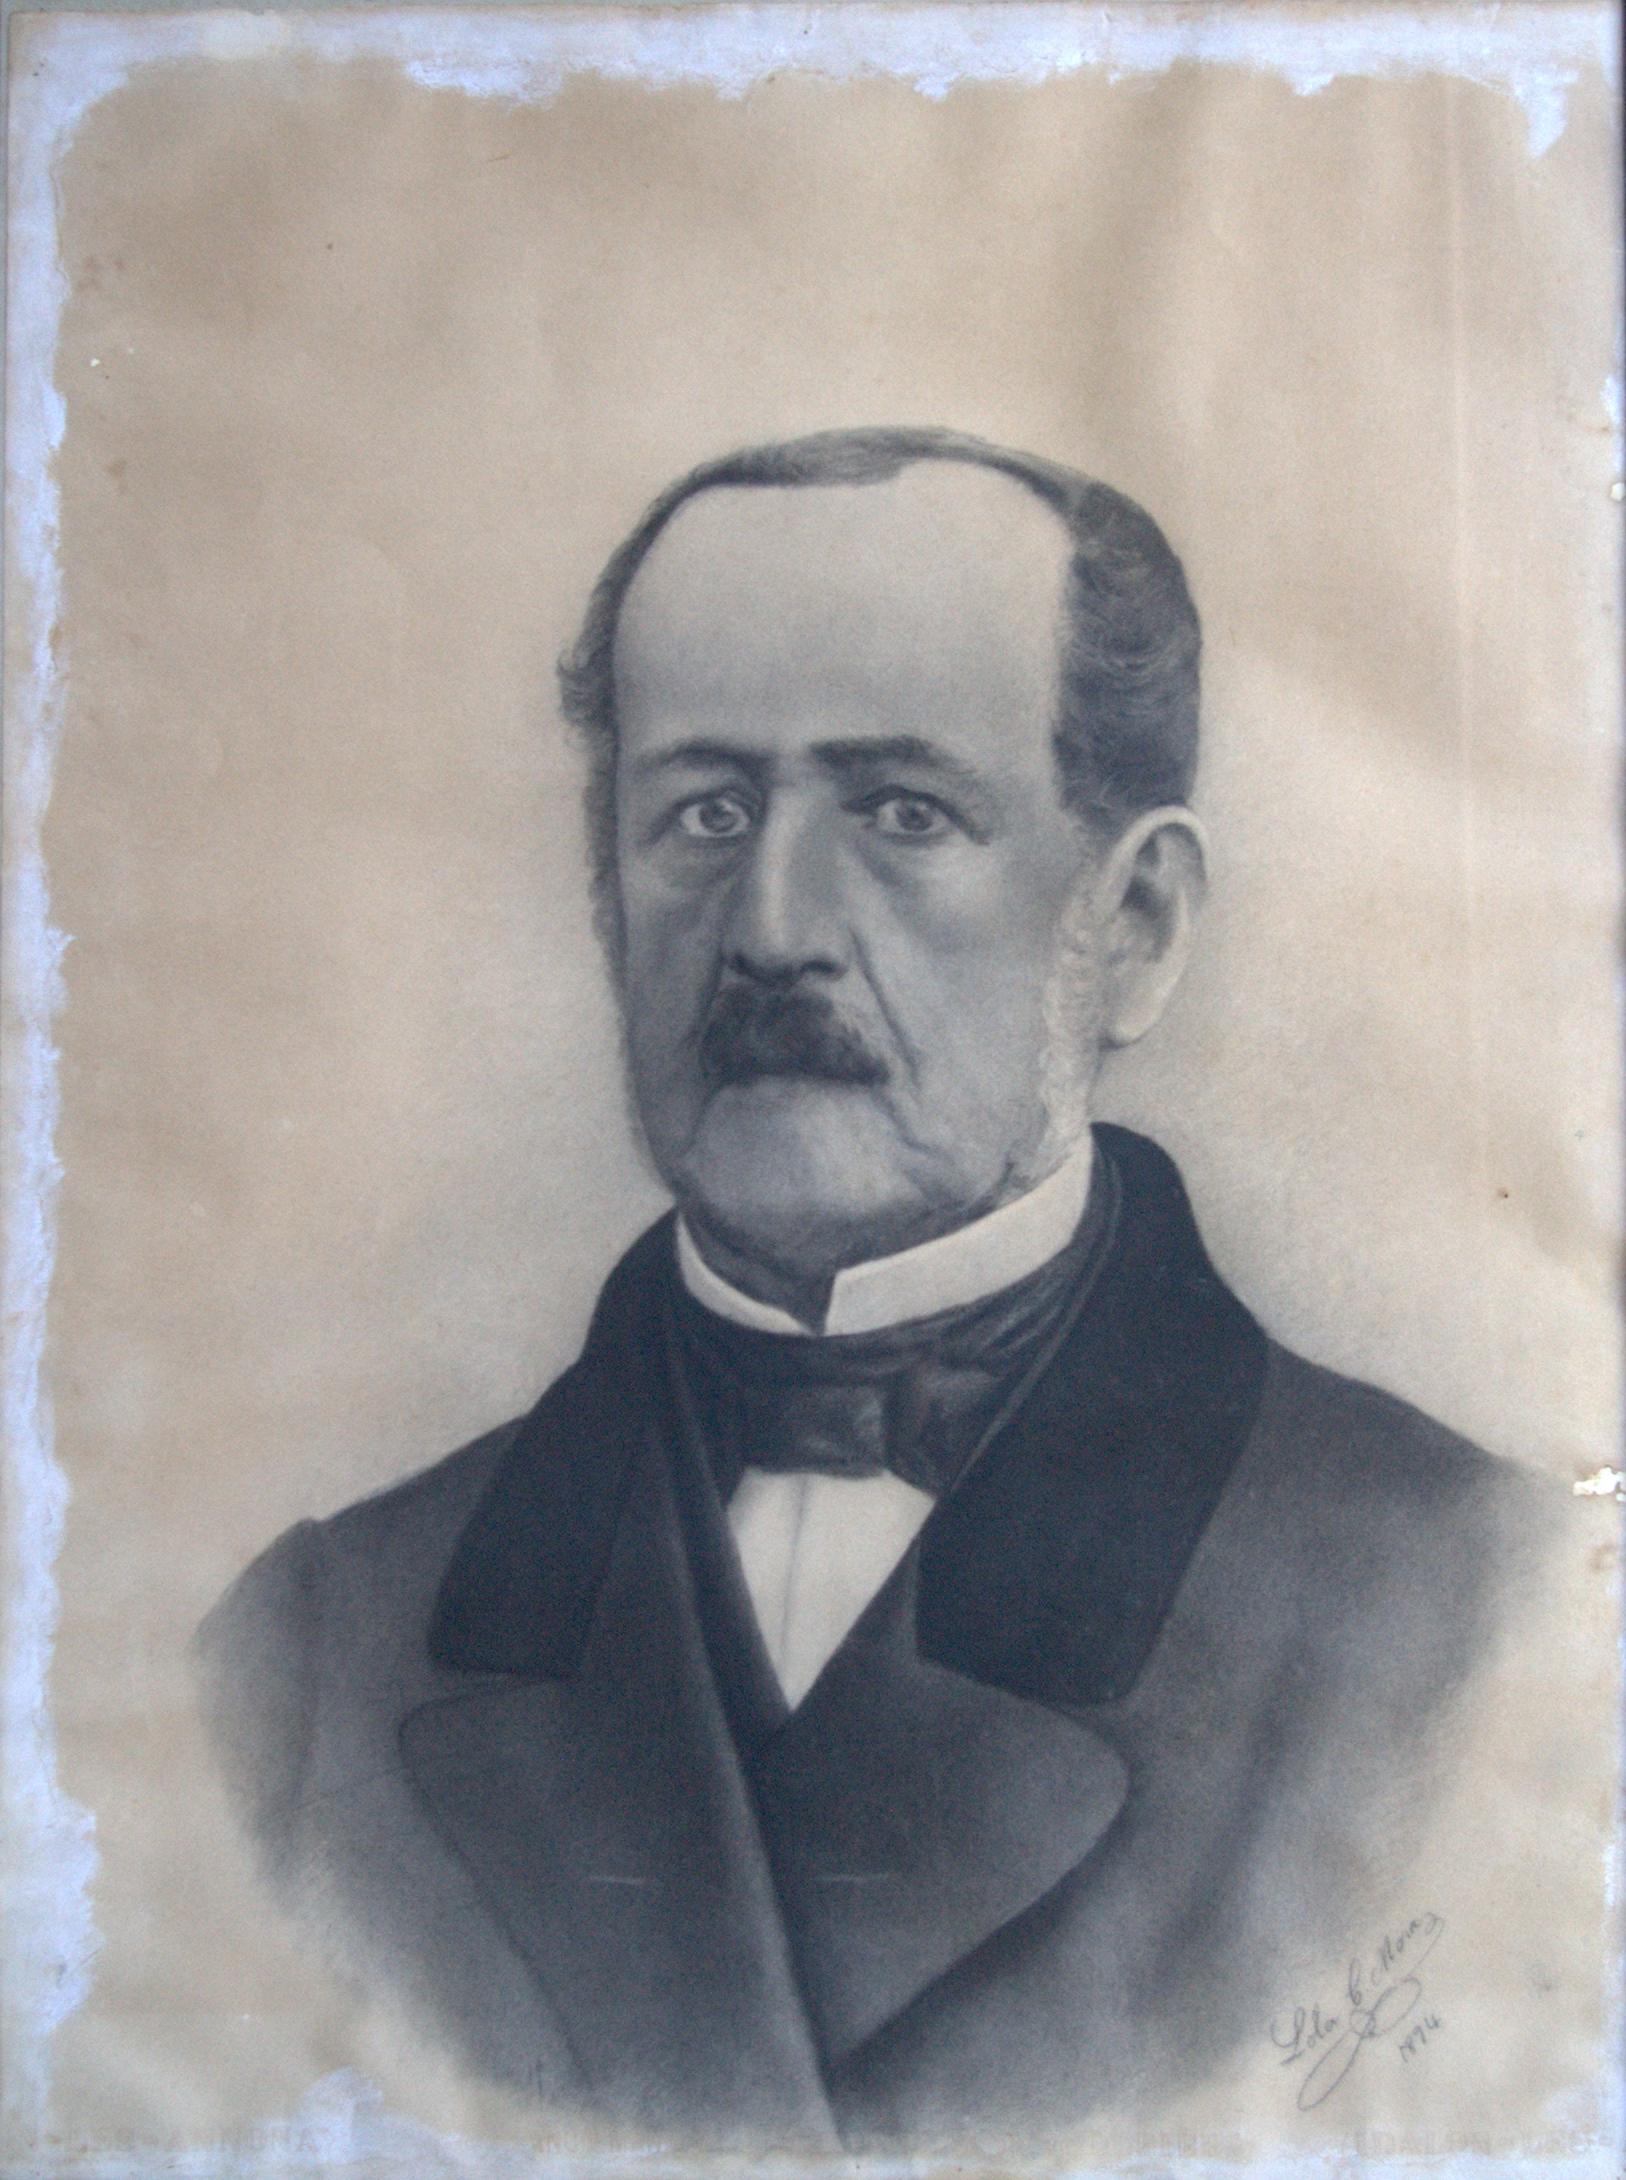 Depiction of Anselmo Rojo